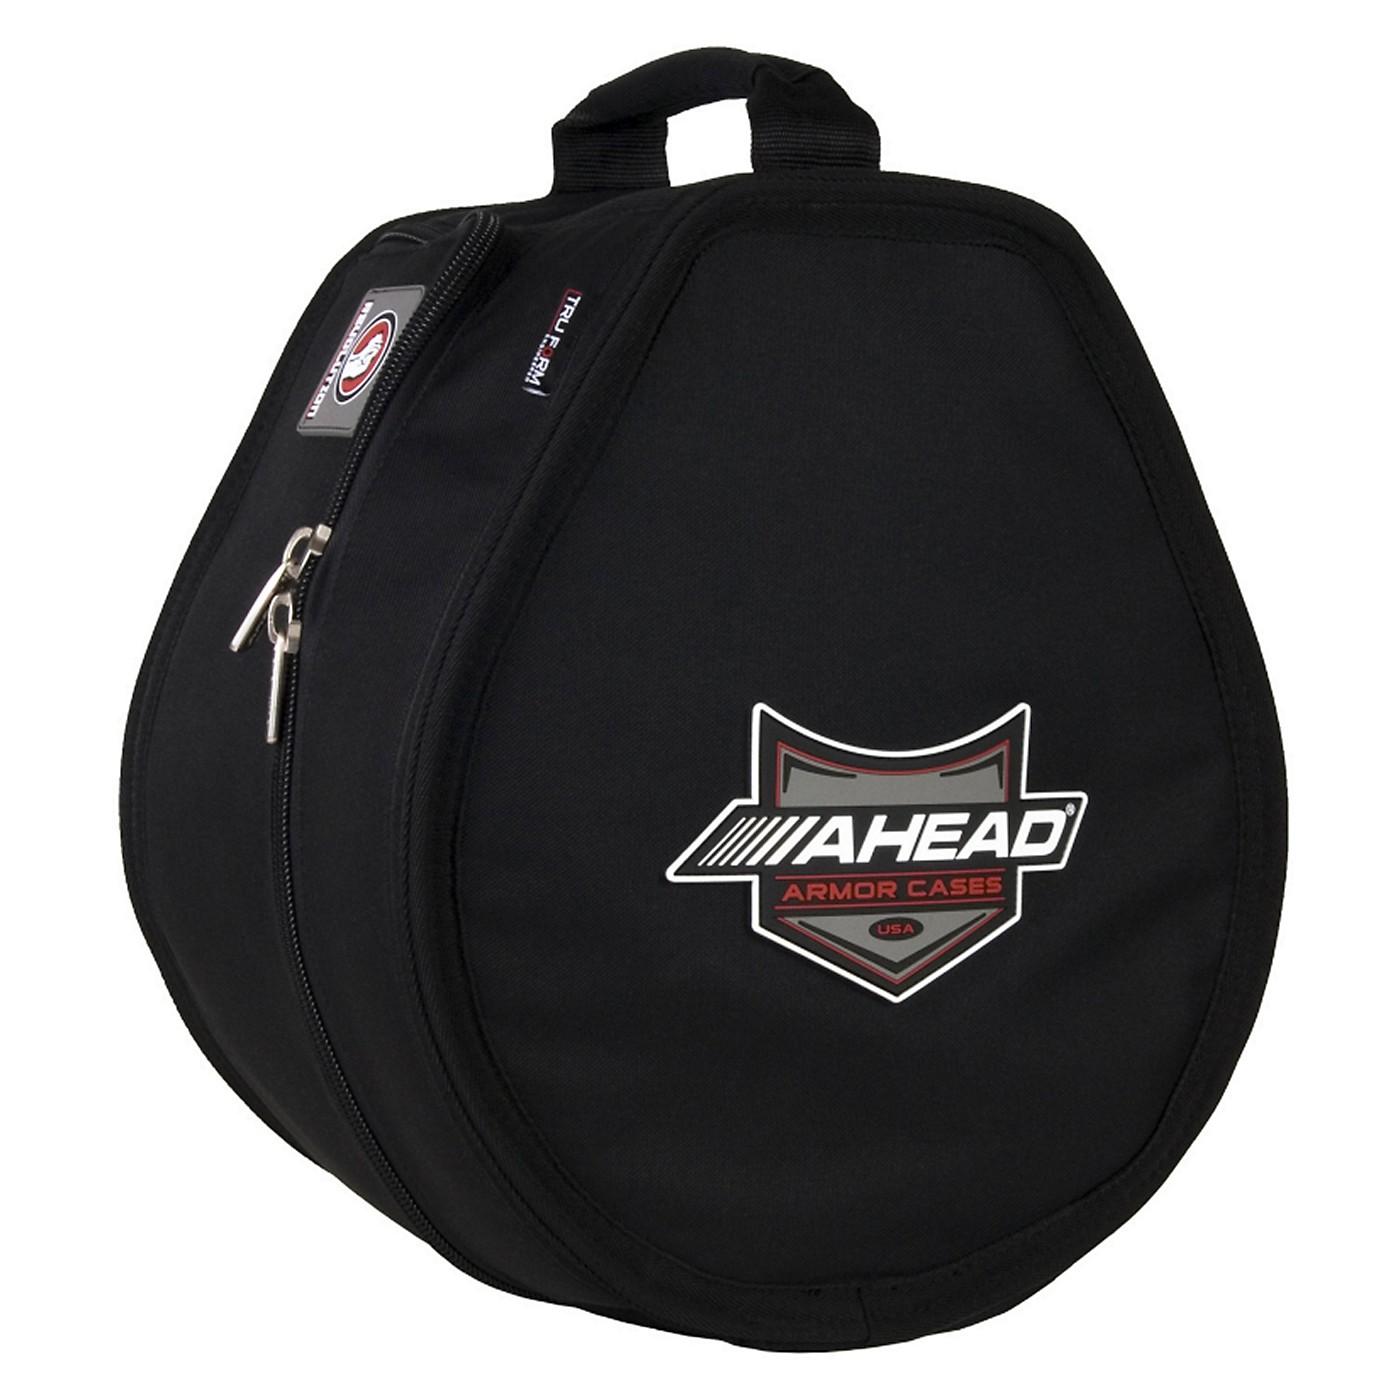 Ahead Armor Cases Standard Tom Case thumbnail